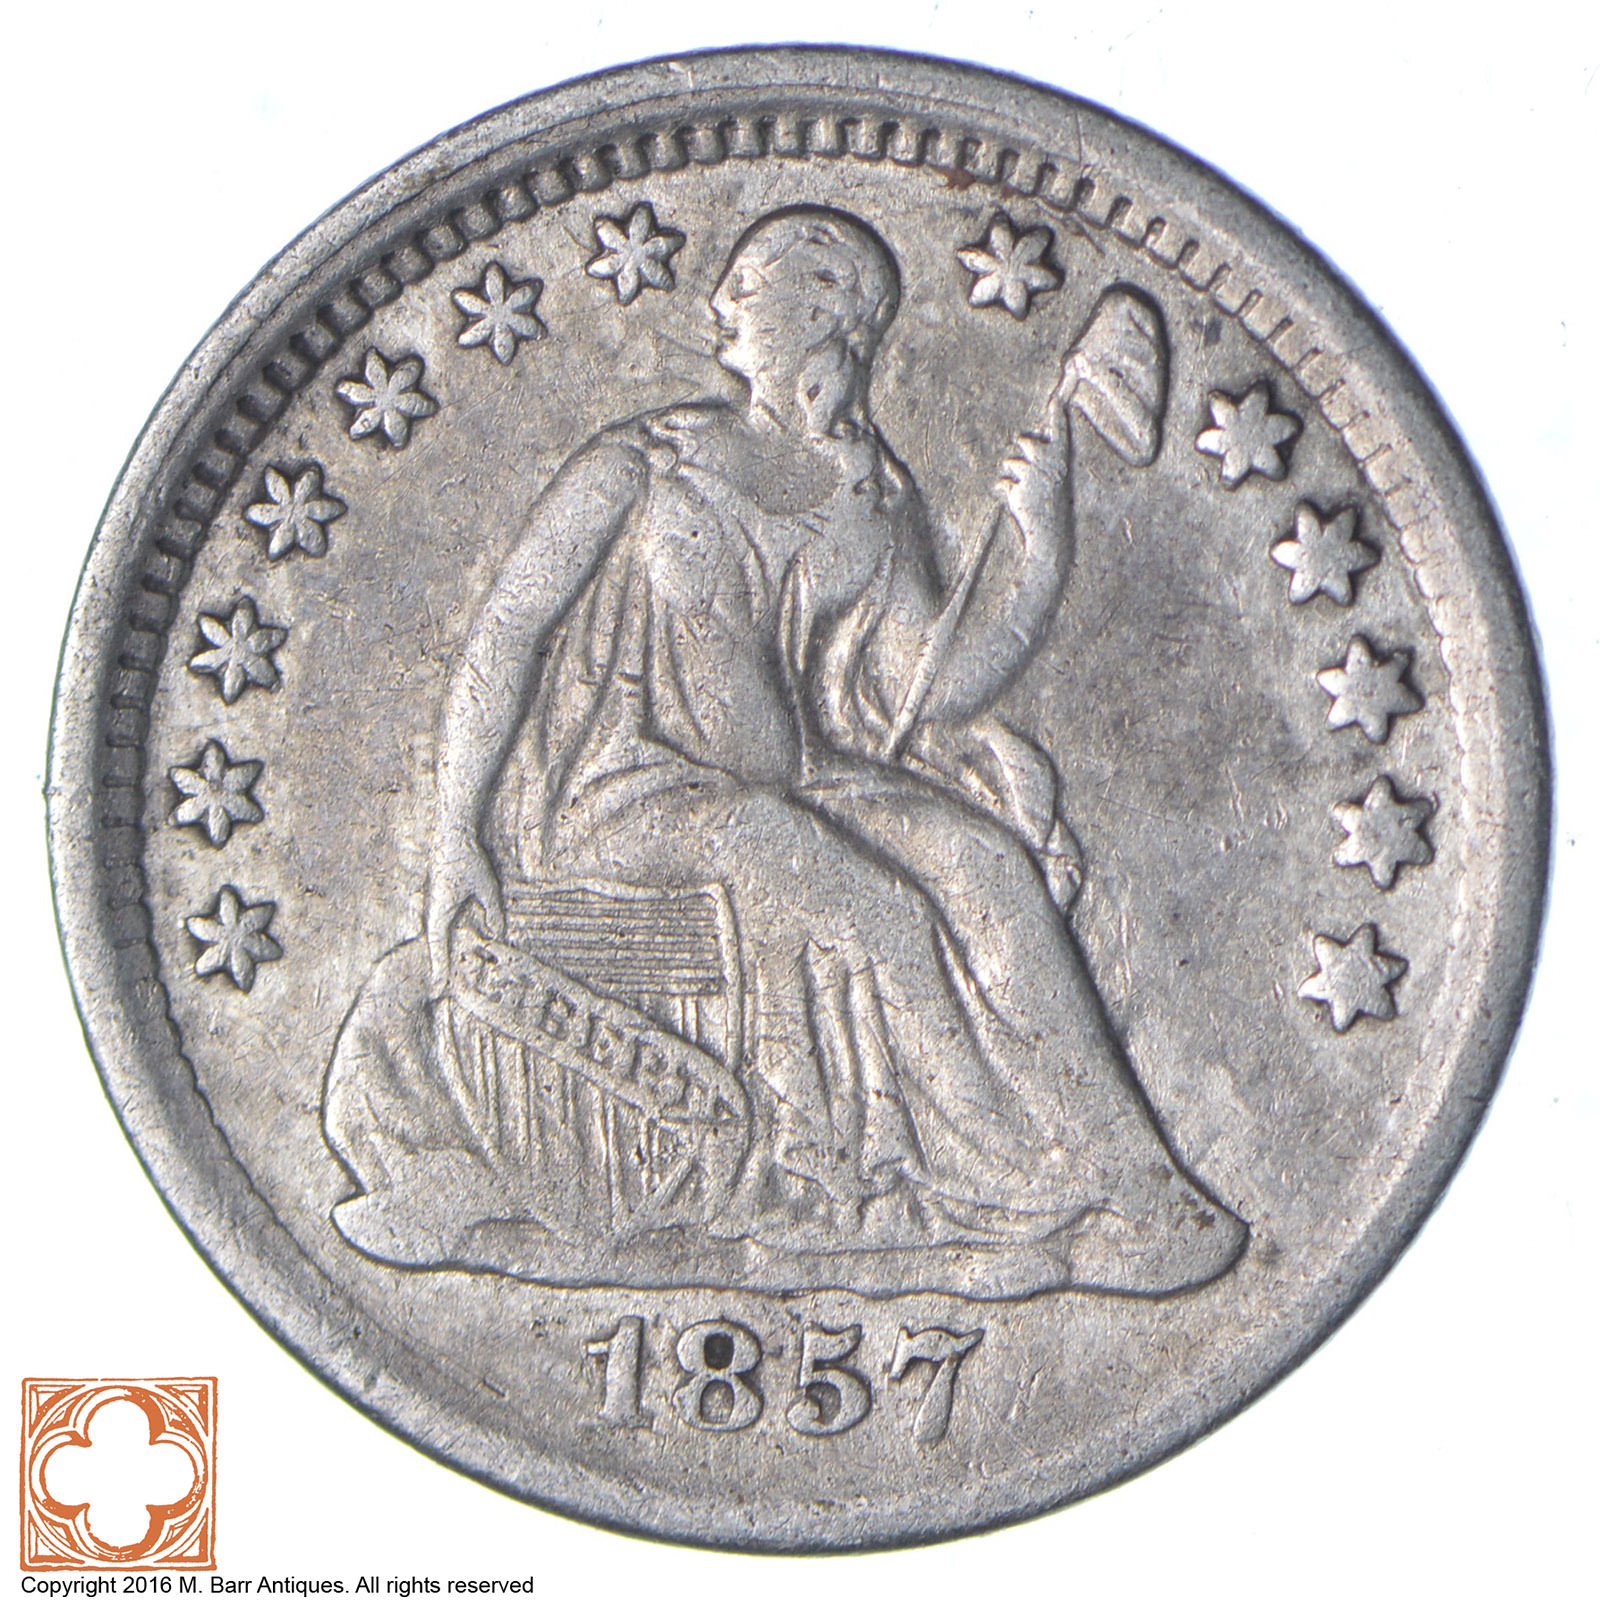 1857 half dime coin value